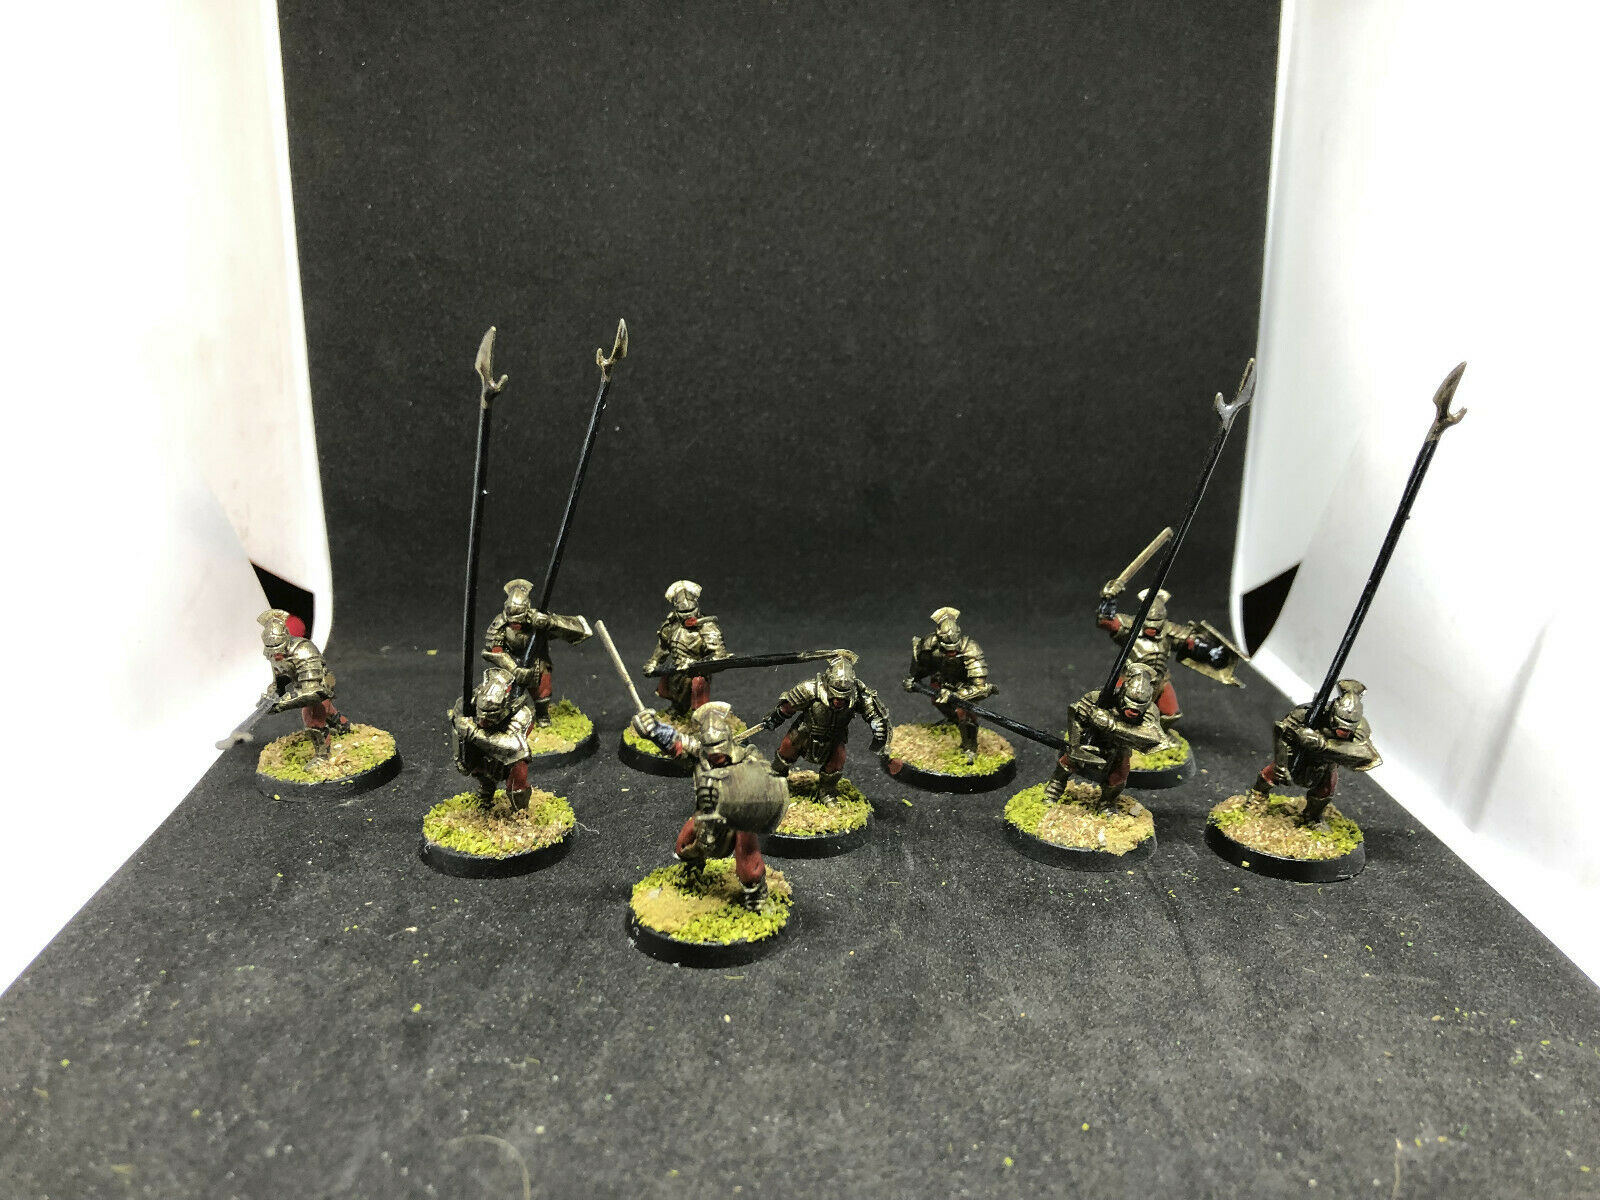 LOTR Uruk-hai warriors pro painted